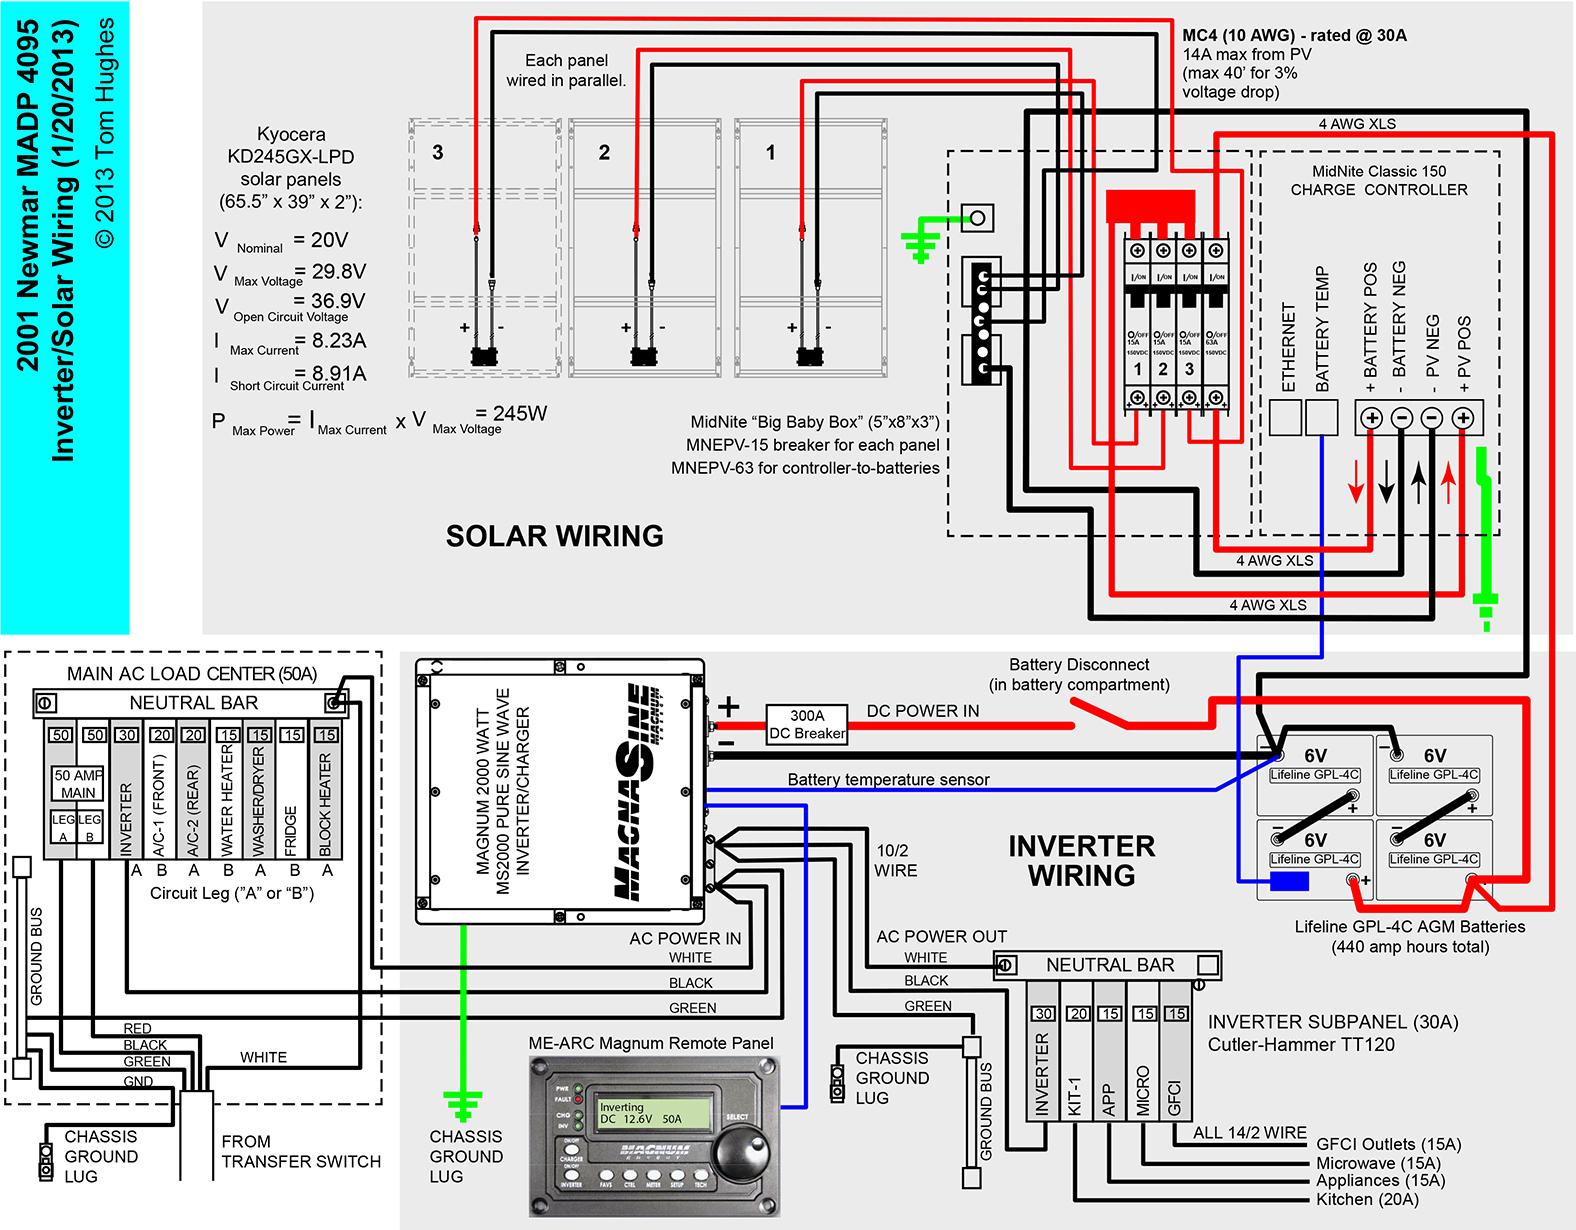 Rv Inverter Wiring Diagram | Wiring Diagram - Rv Inverter Wiring Diagram